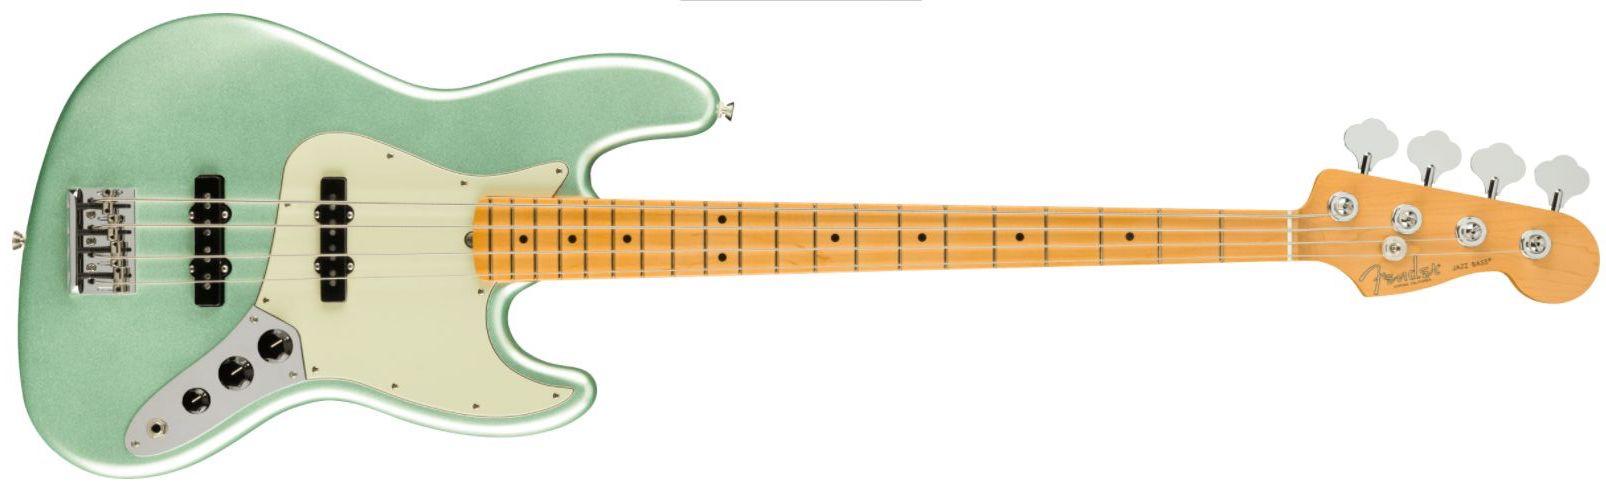 FENDER-American-Professional-PRO-II-Jazz-Bass-MN-Mystic-Surf-Green-0193972718-sku-24316